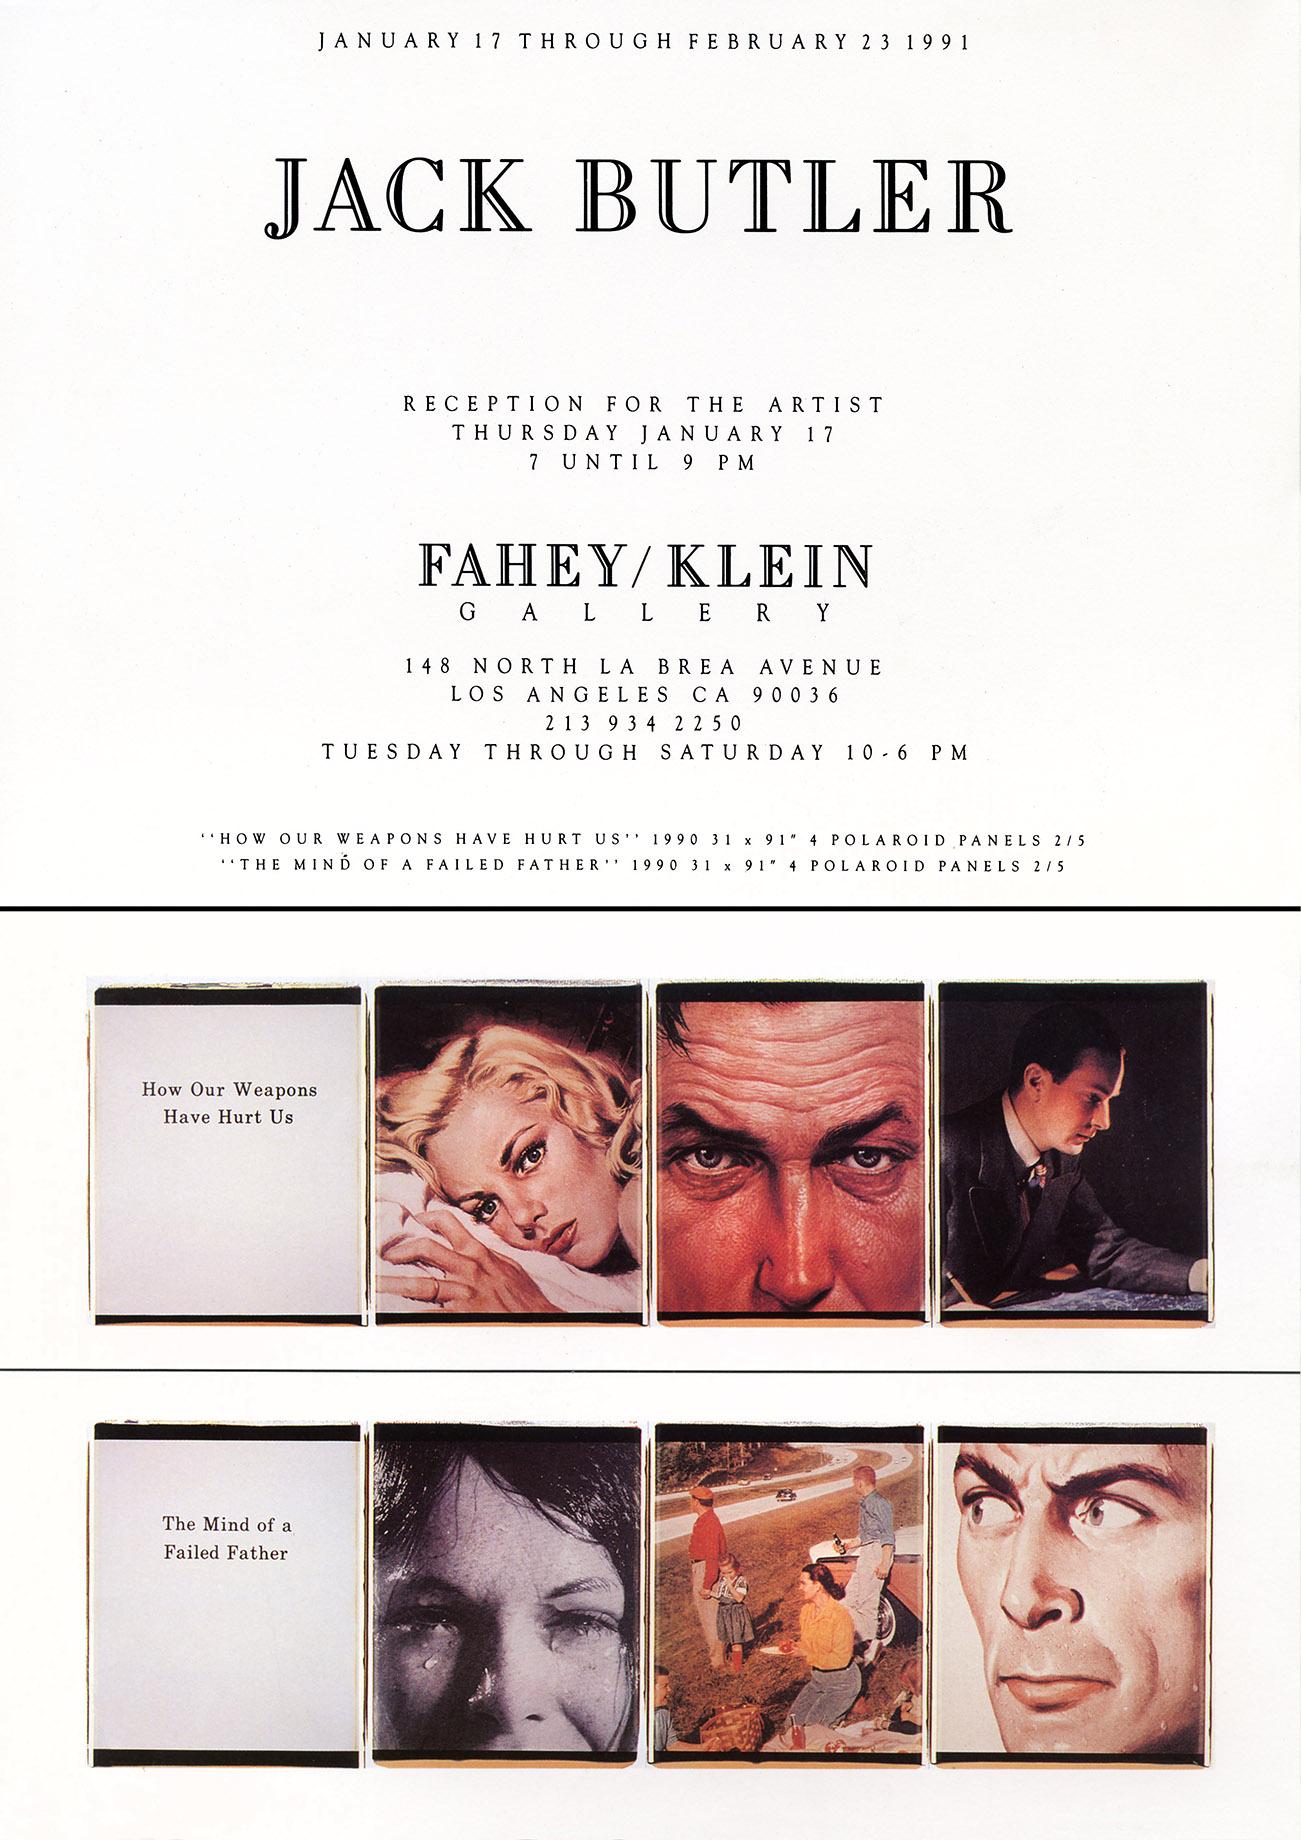 Fahey Klein Exhibition 1991